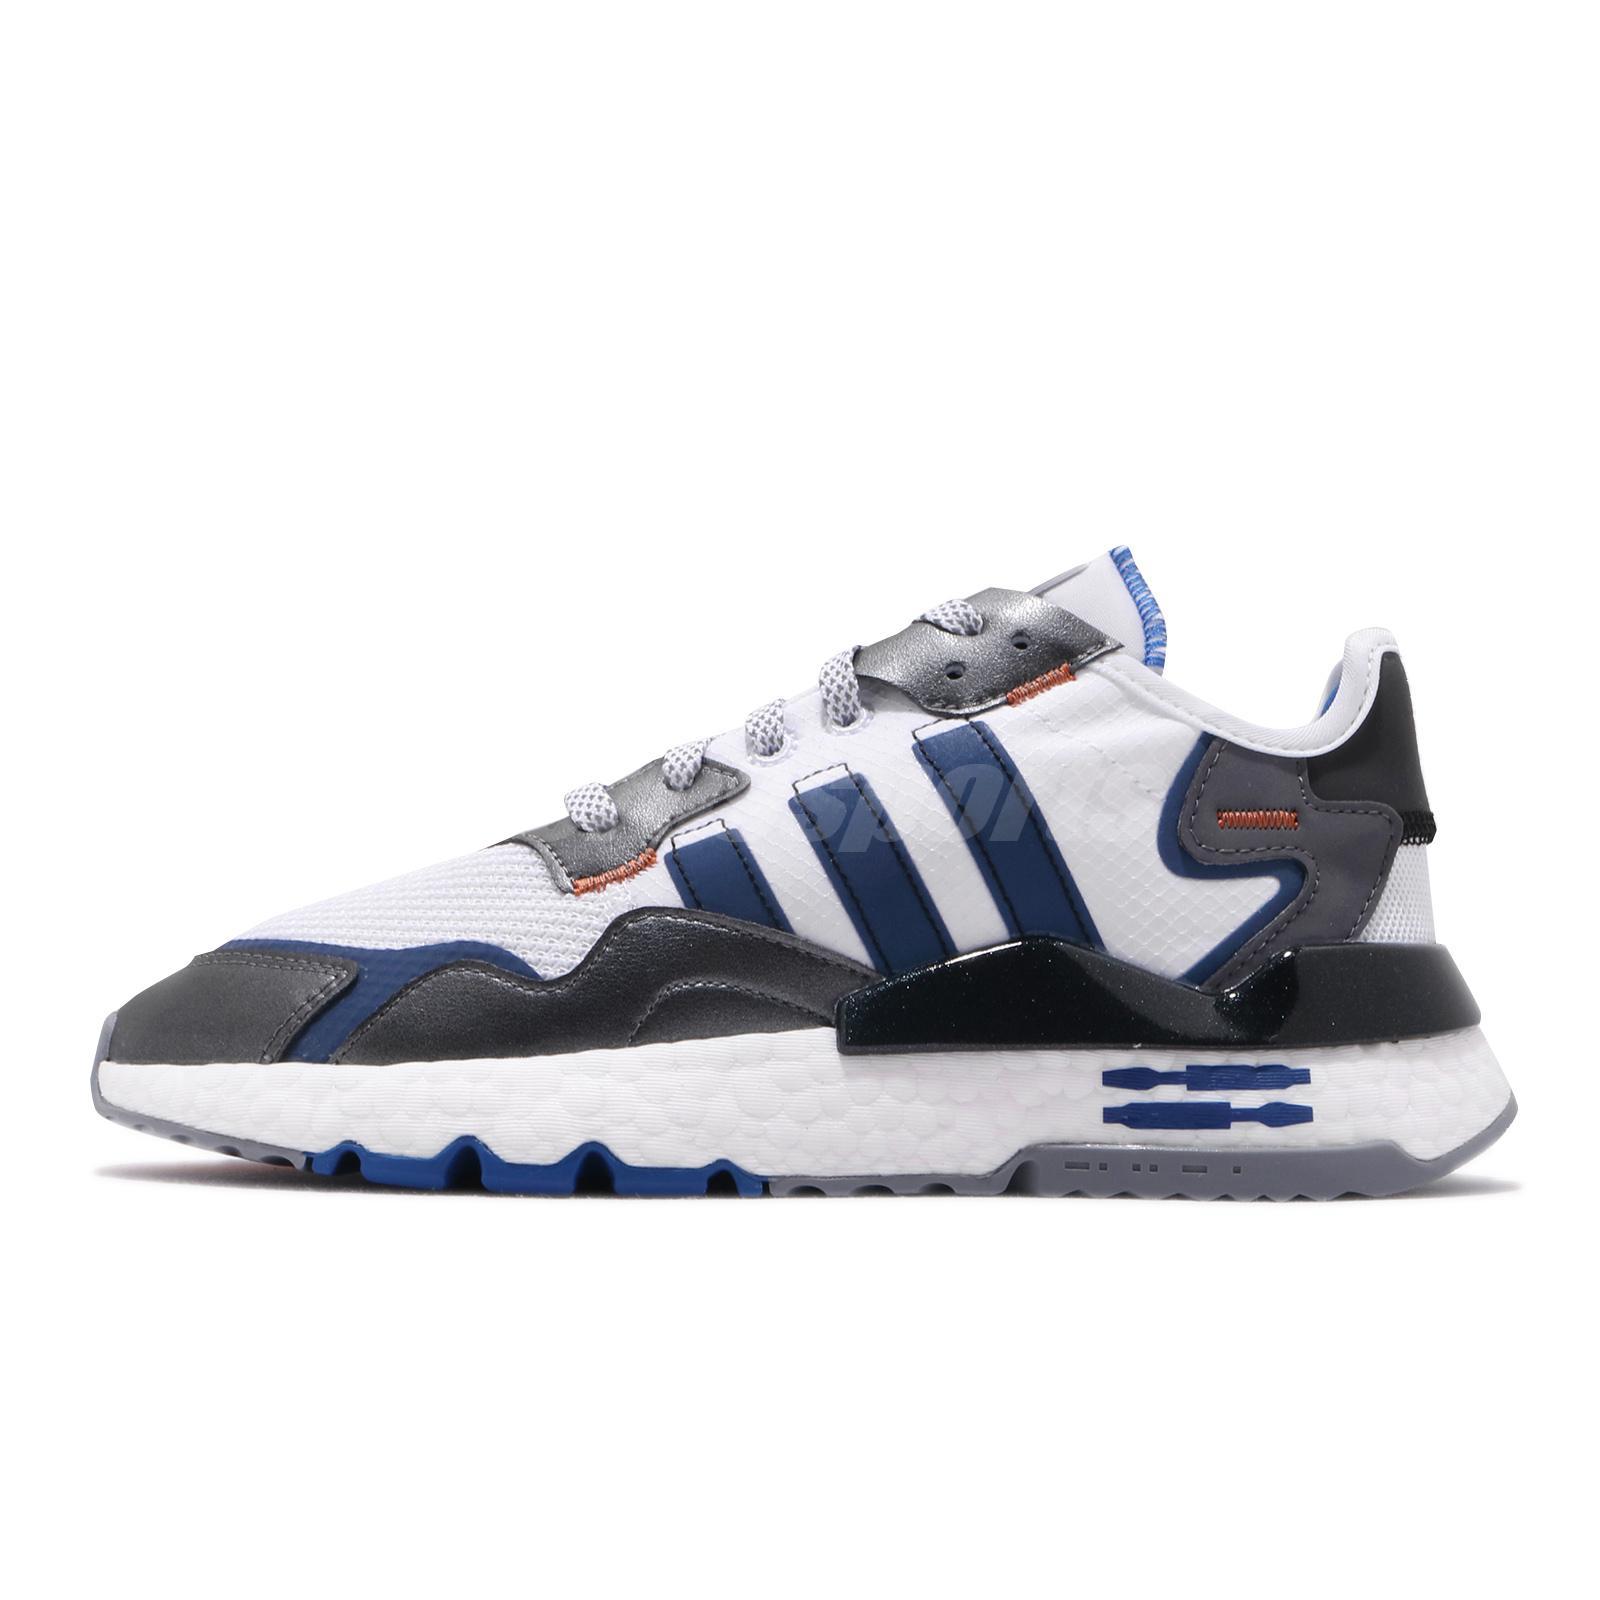 Athletic Shoes adidas Originals Nite Jogger STAR WARS R2D2 White ...